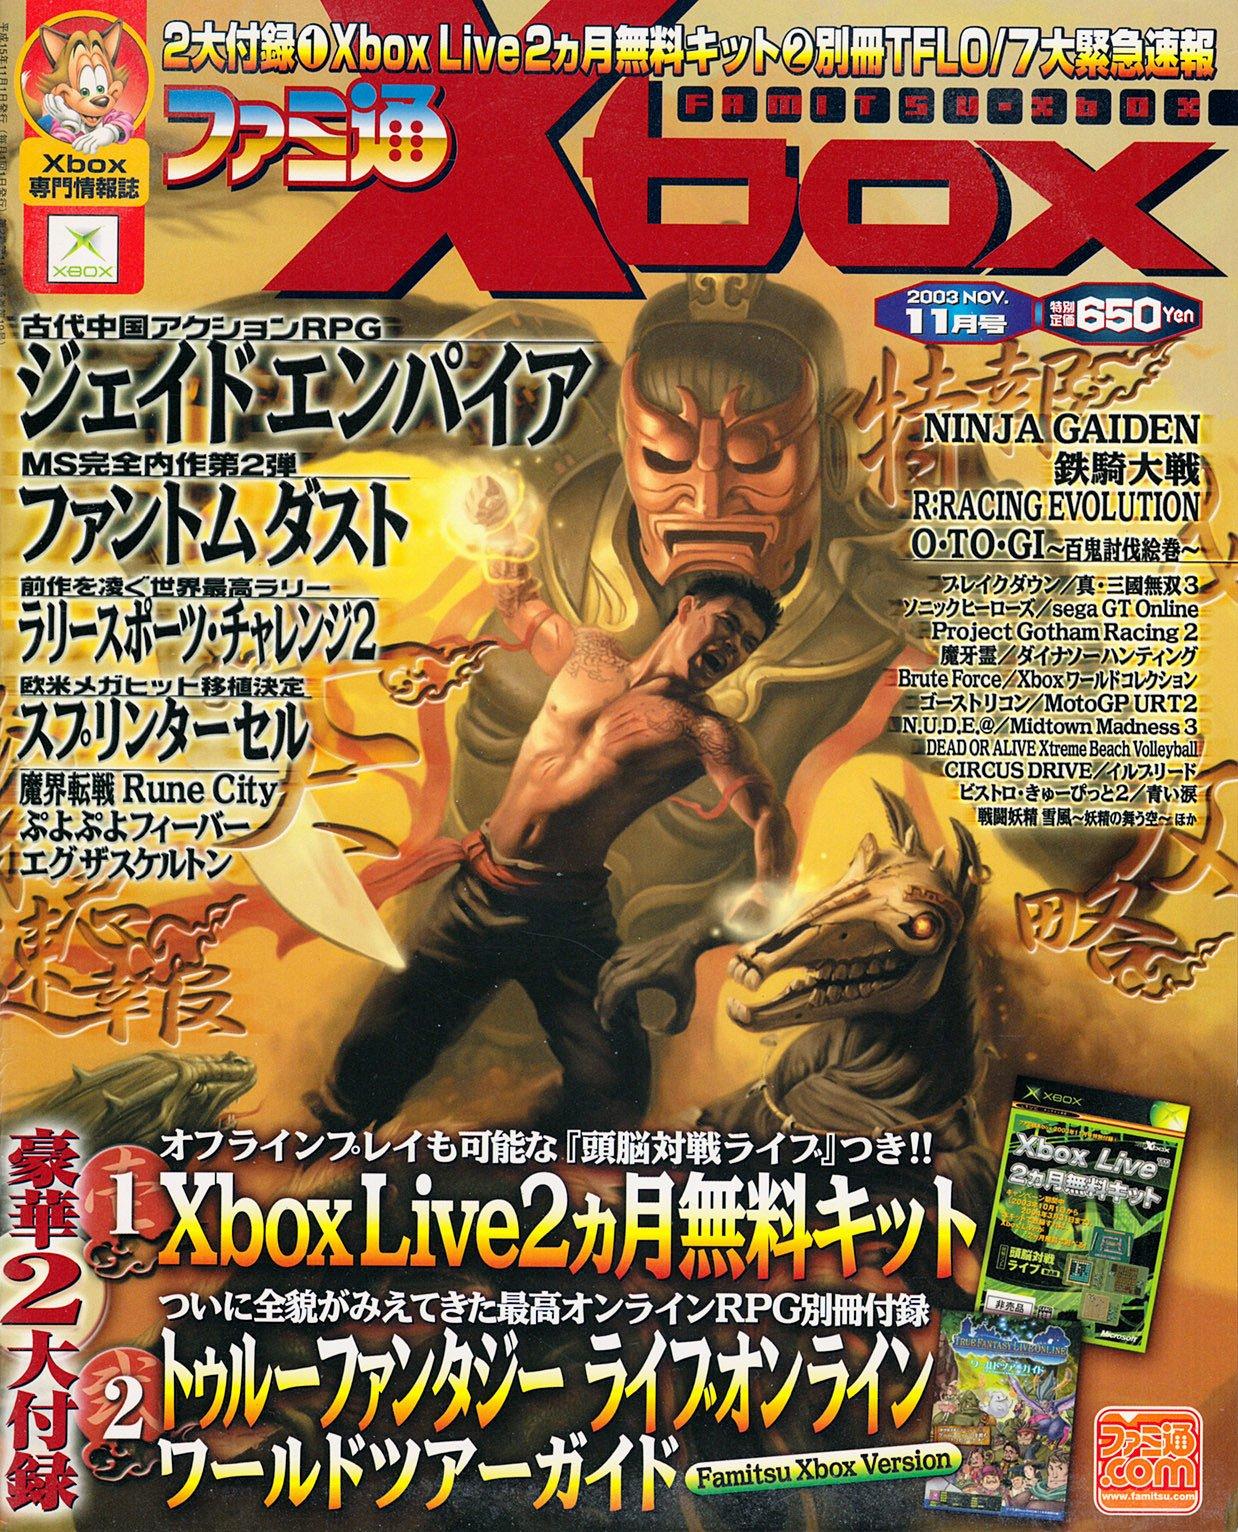 Famitsu Xbox Issue 021 (November 2003)